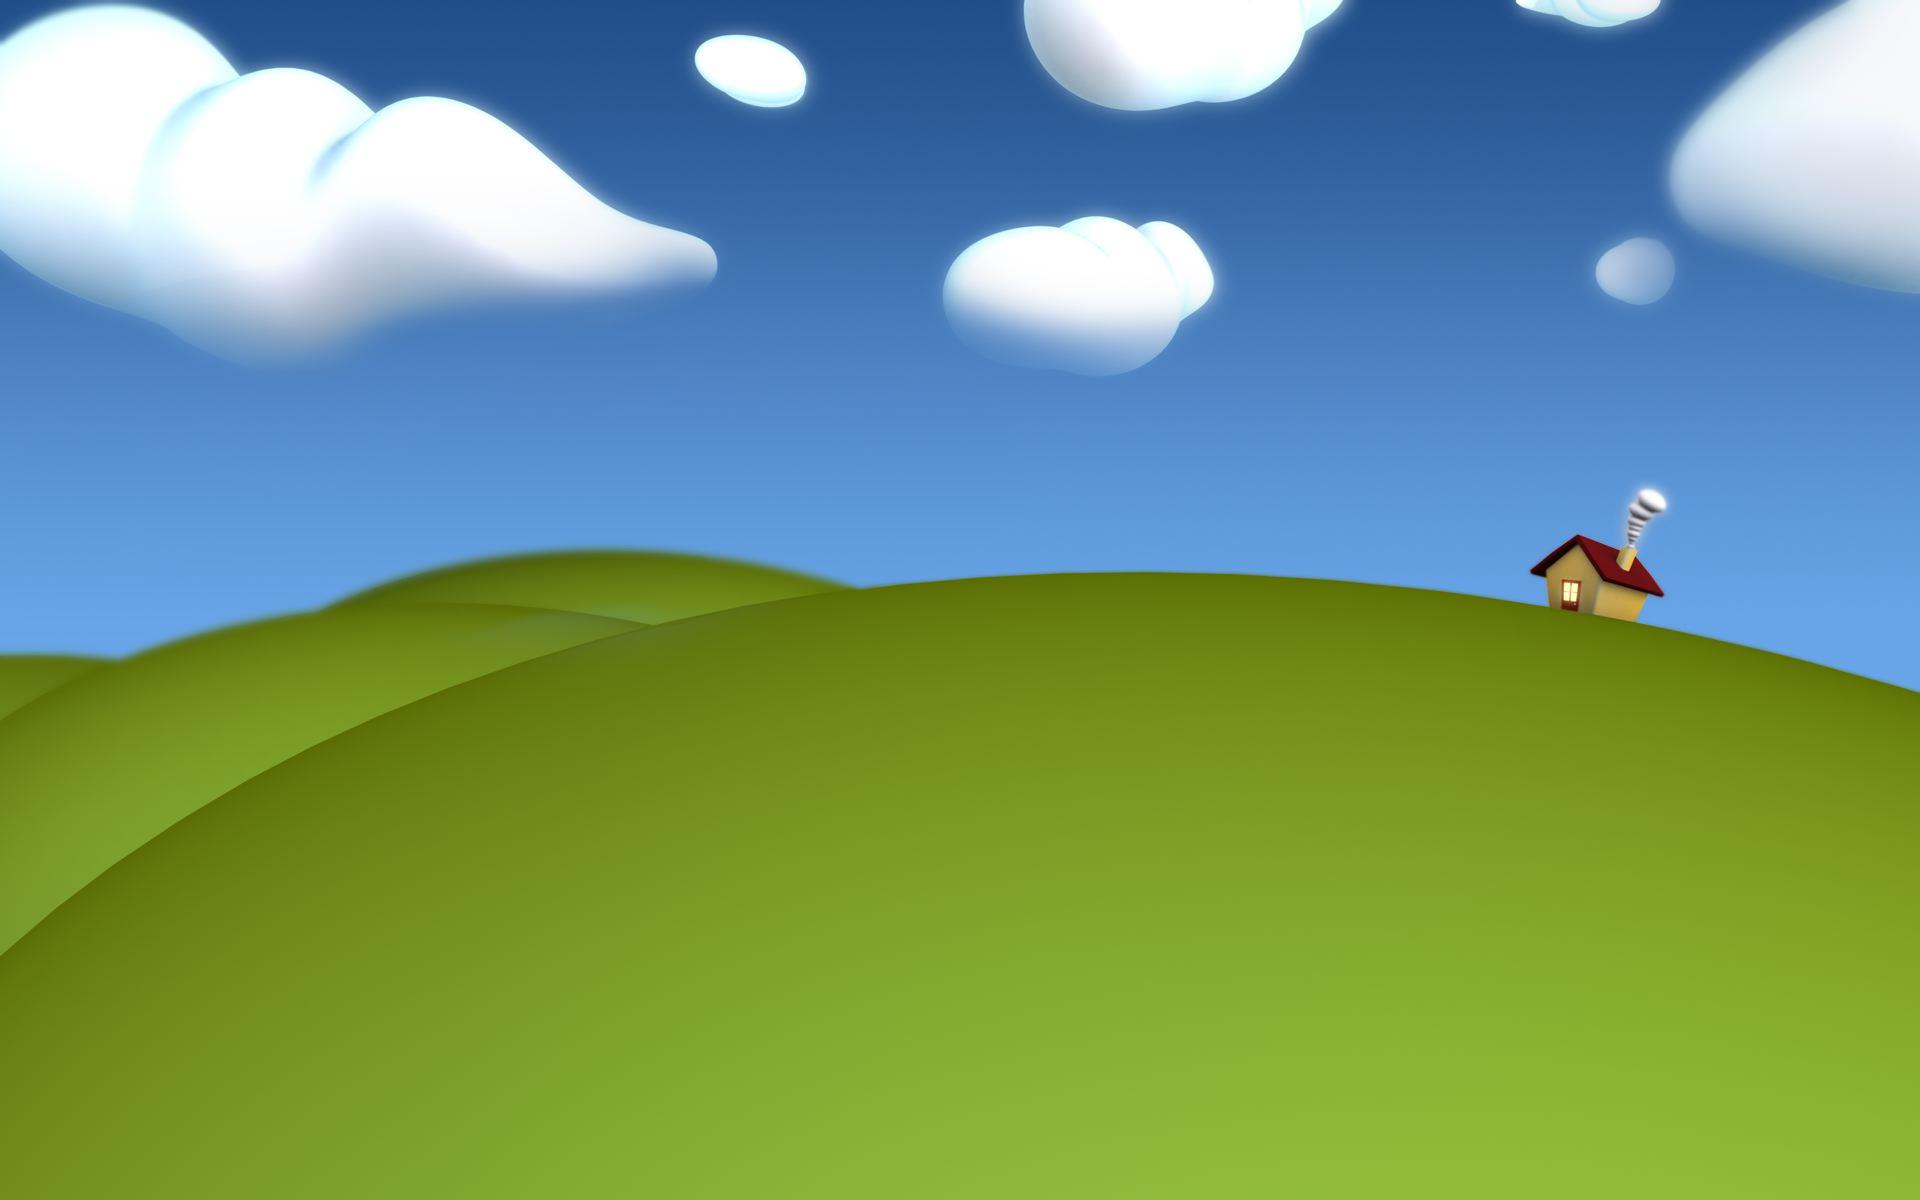 Cartoon Background Images